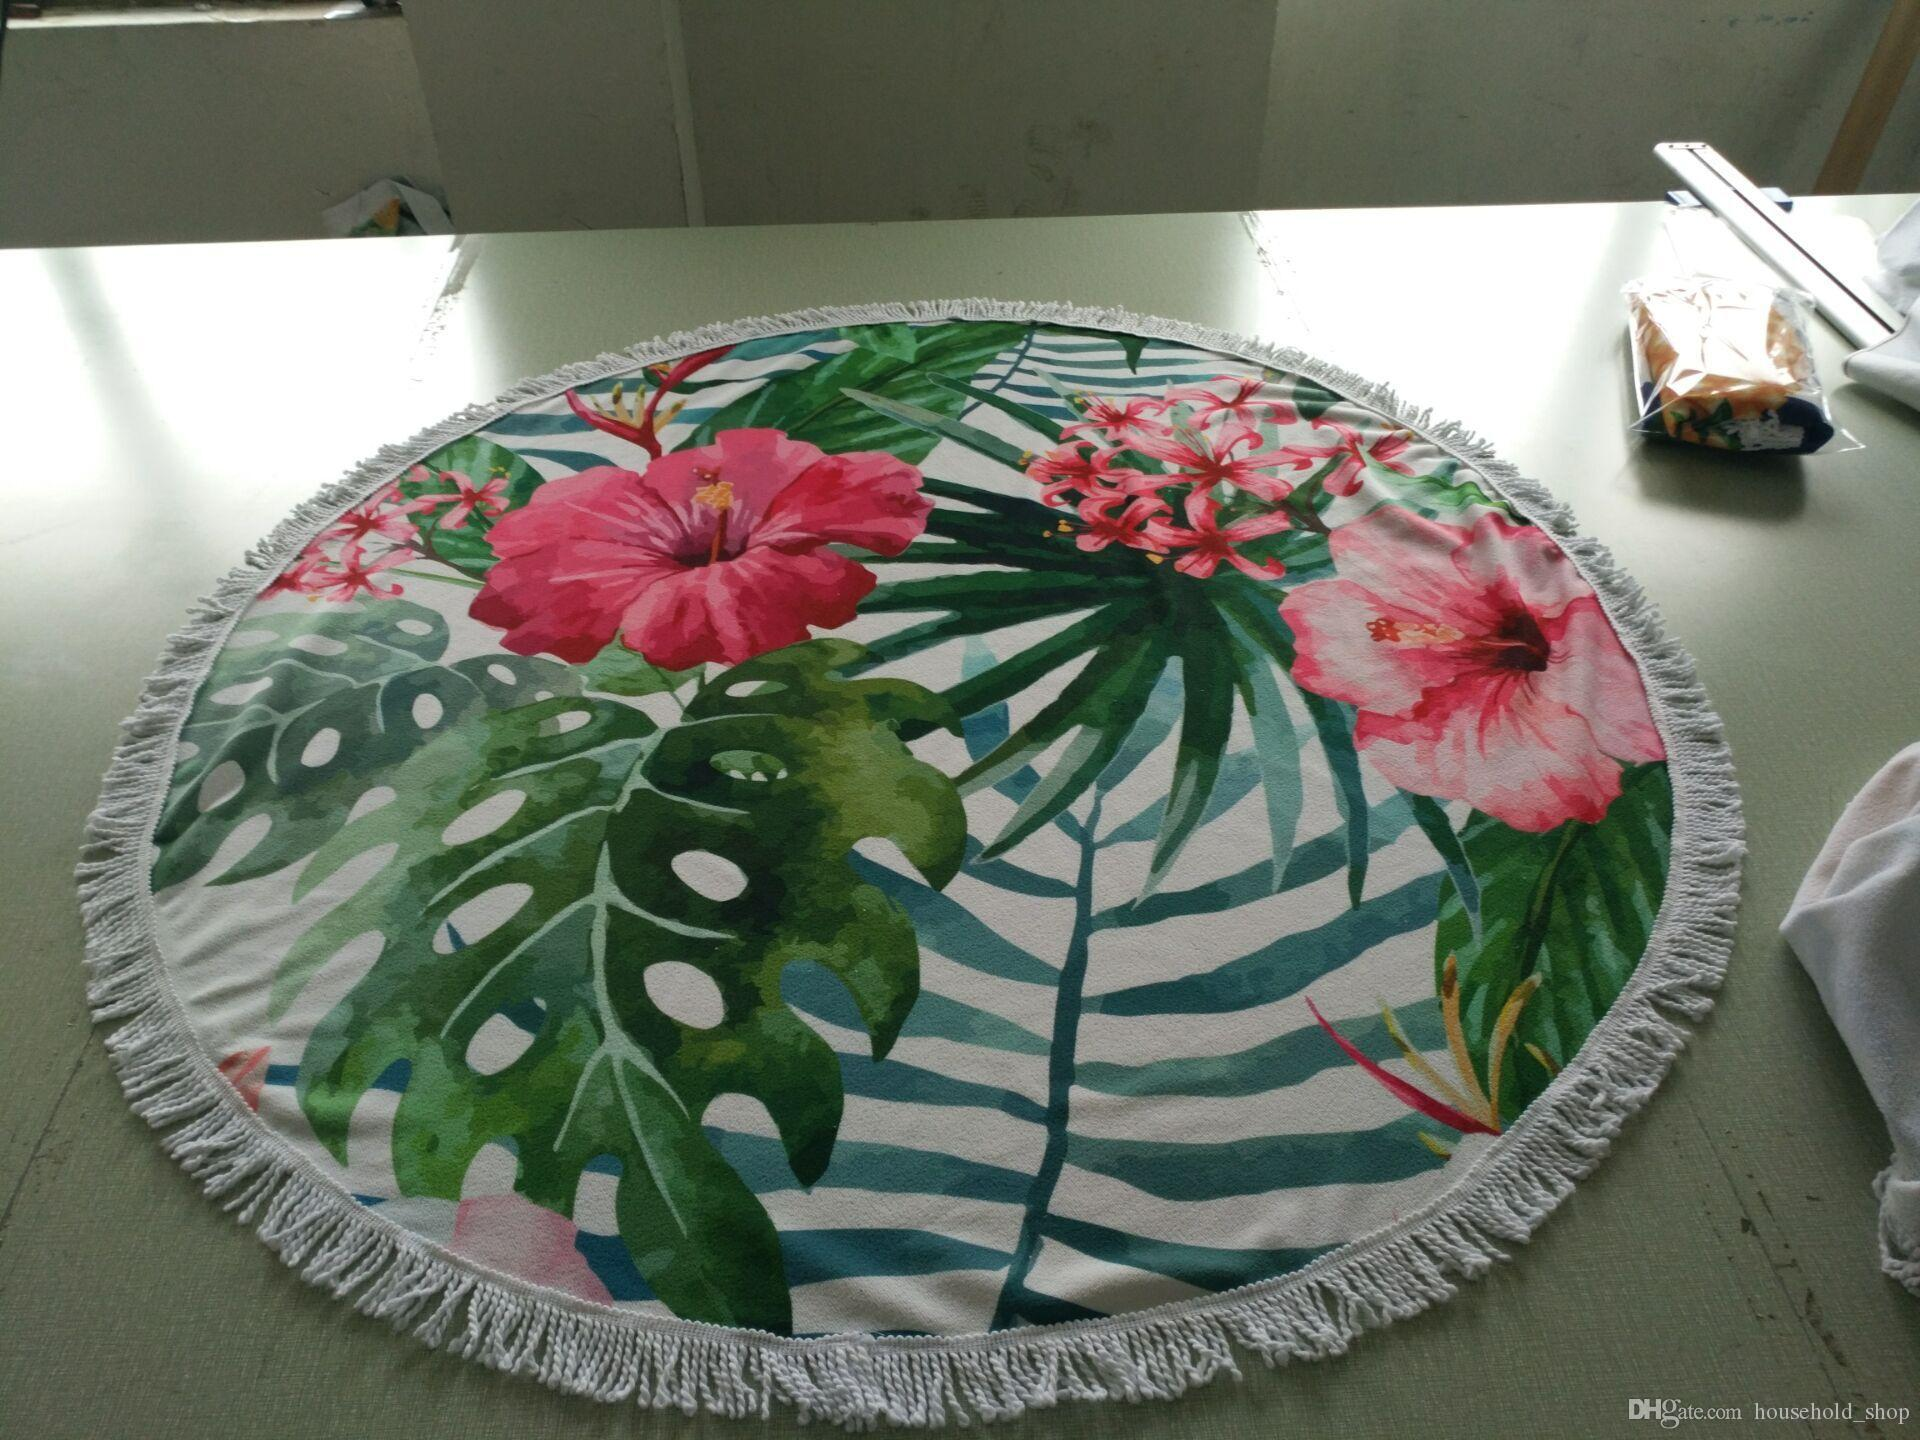 2018 Hot Sale Polyester Round Beach Towel Beach Blanket Round Beach Mat Tapestry Round Yoga Mat with Fringe Tassels